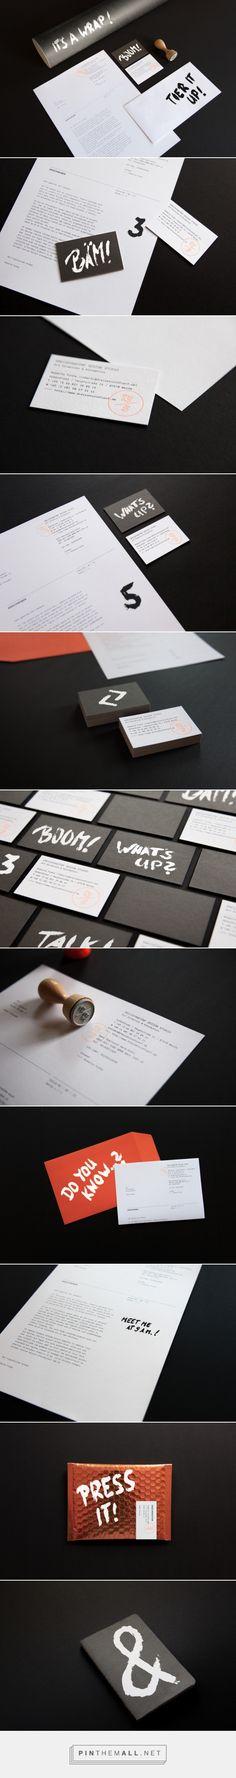 13&5 Studio Branding